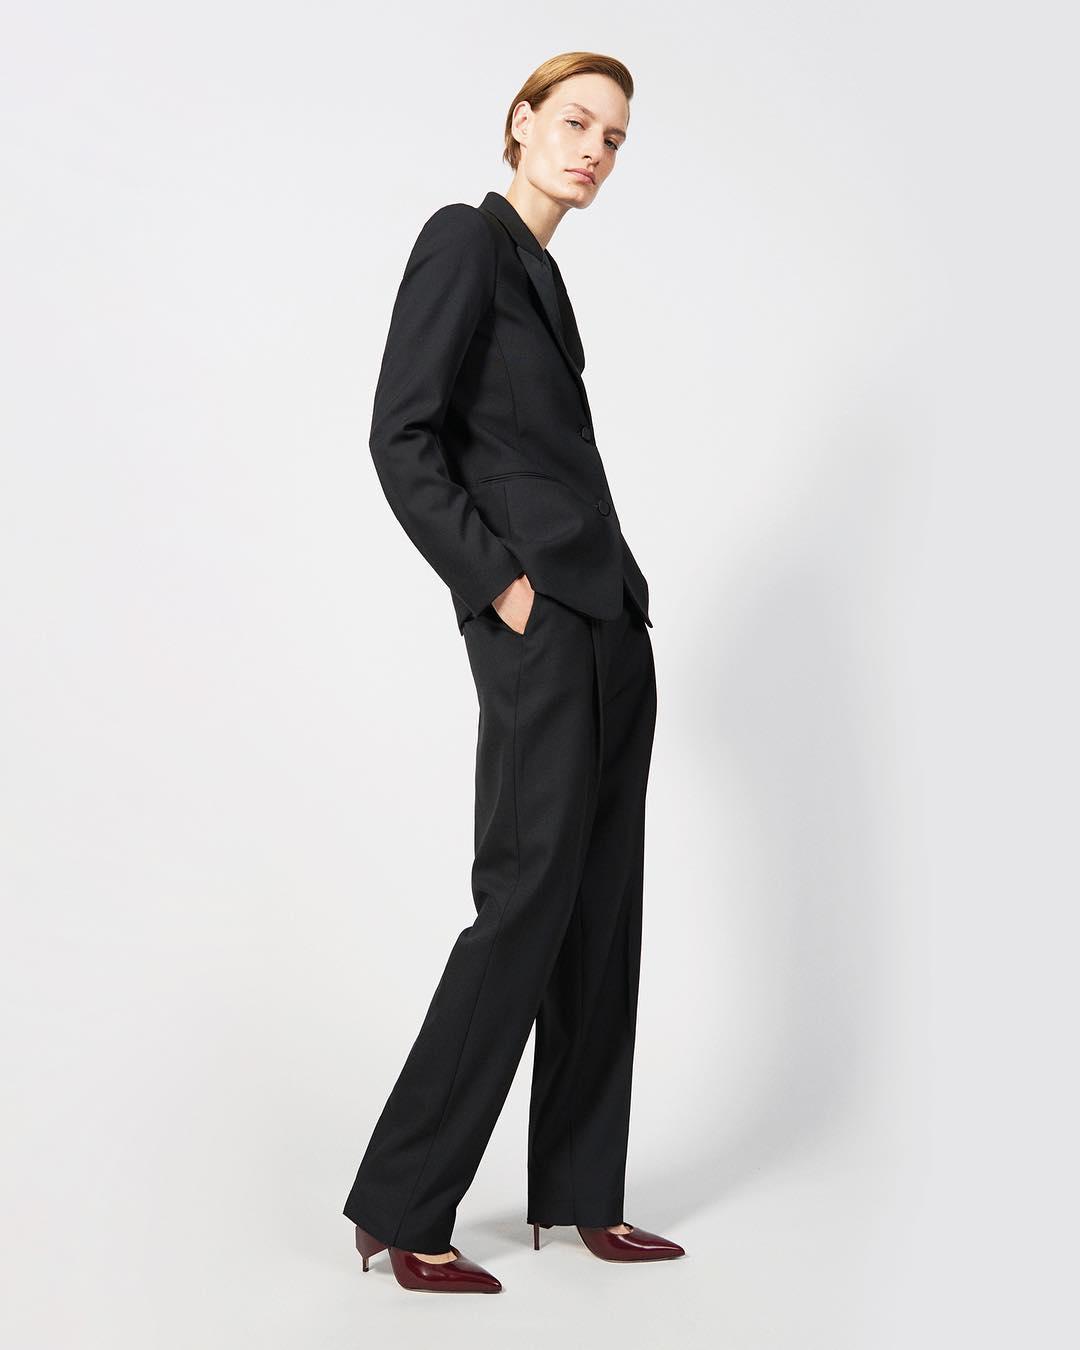 Black Pantsuit By Victoria Beckham 2021